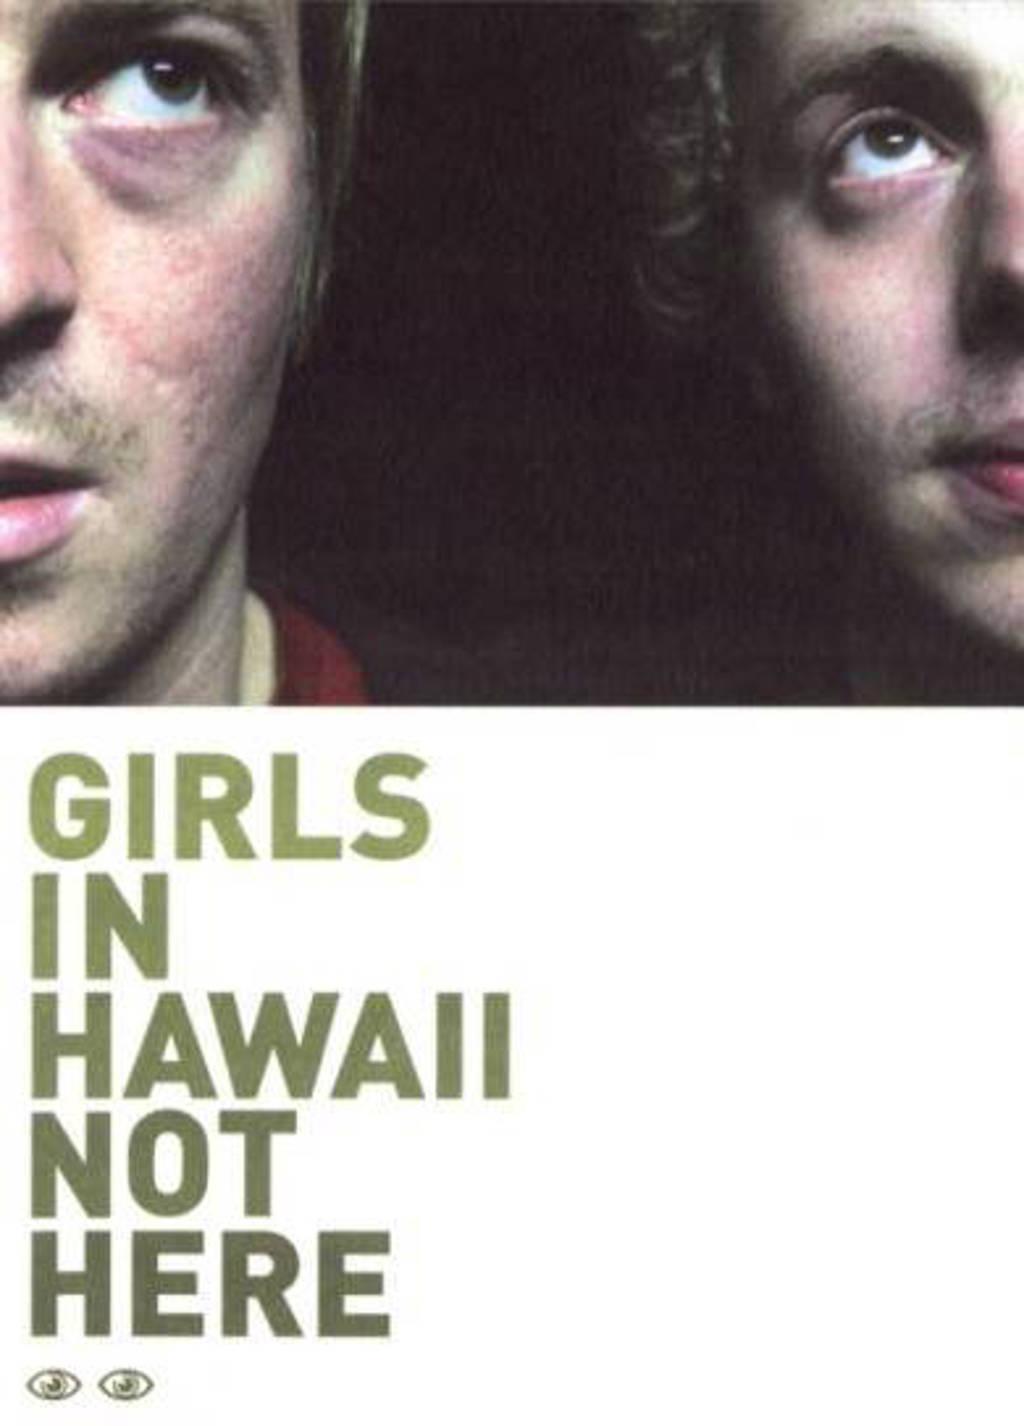 Girls In Hawai - Not Here (DVD)